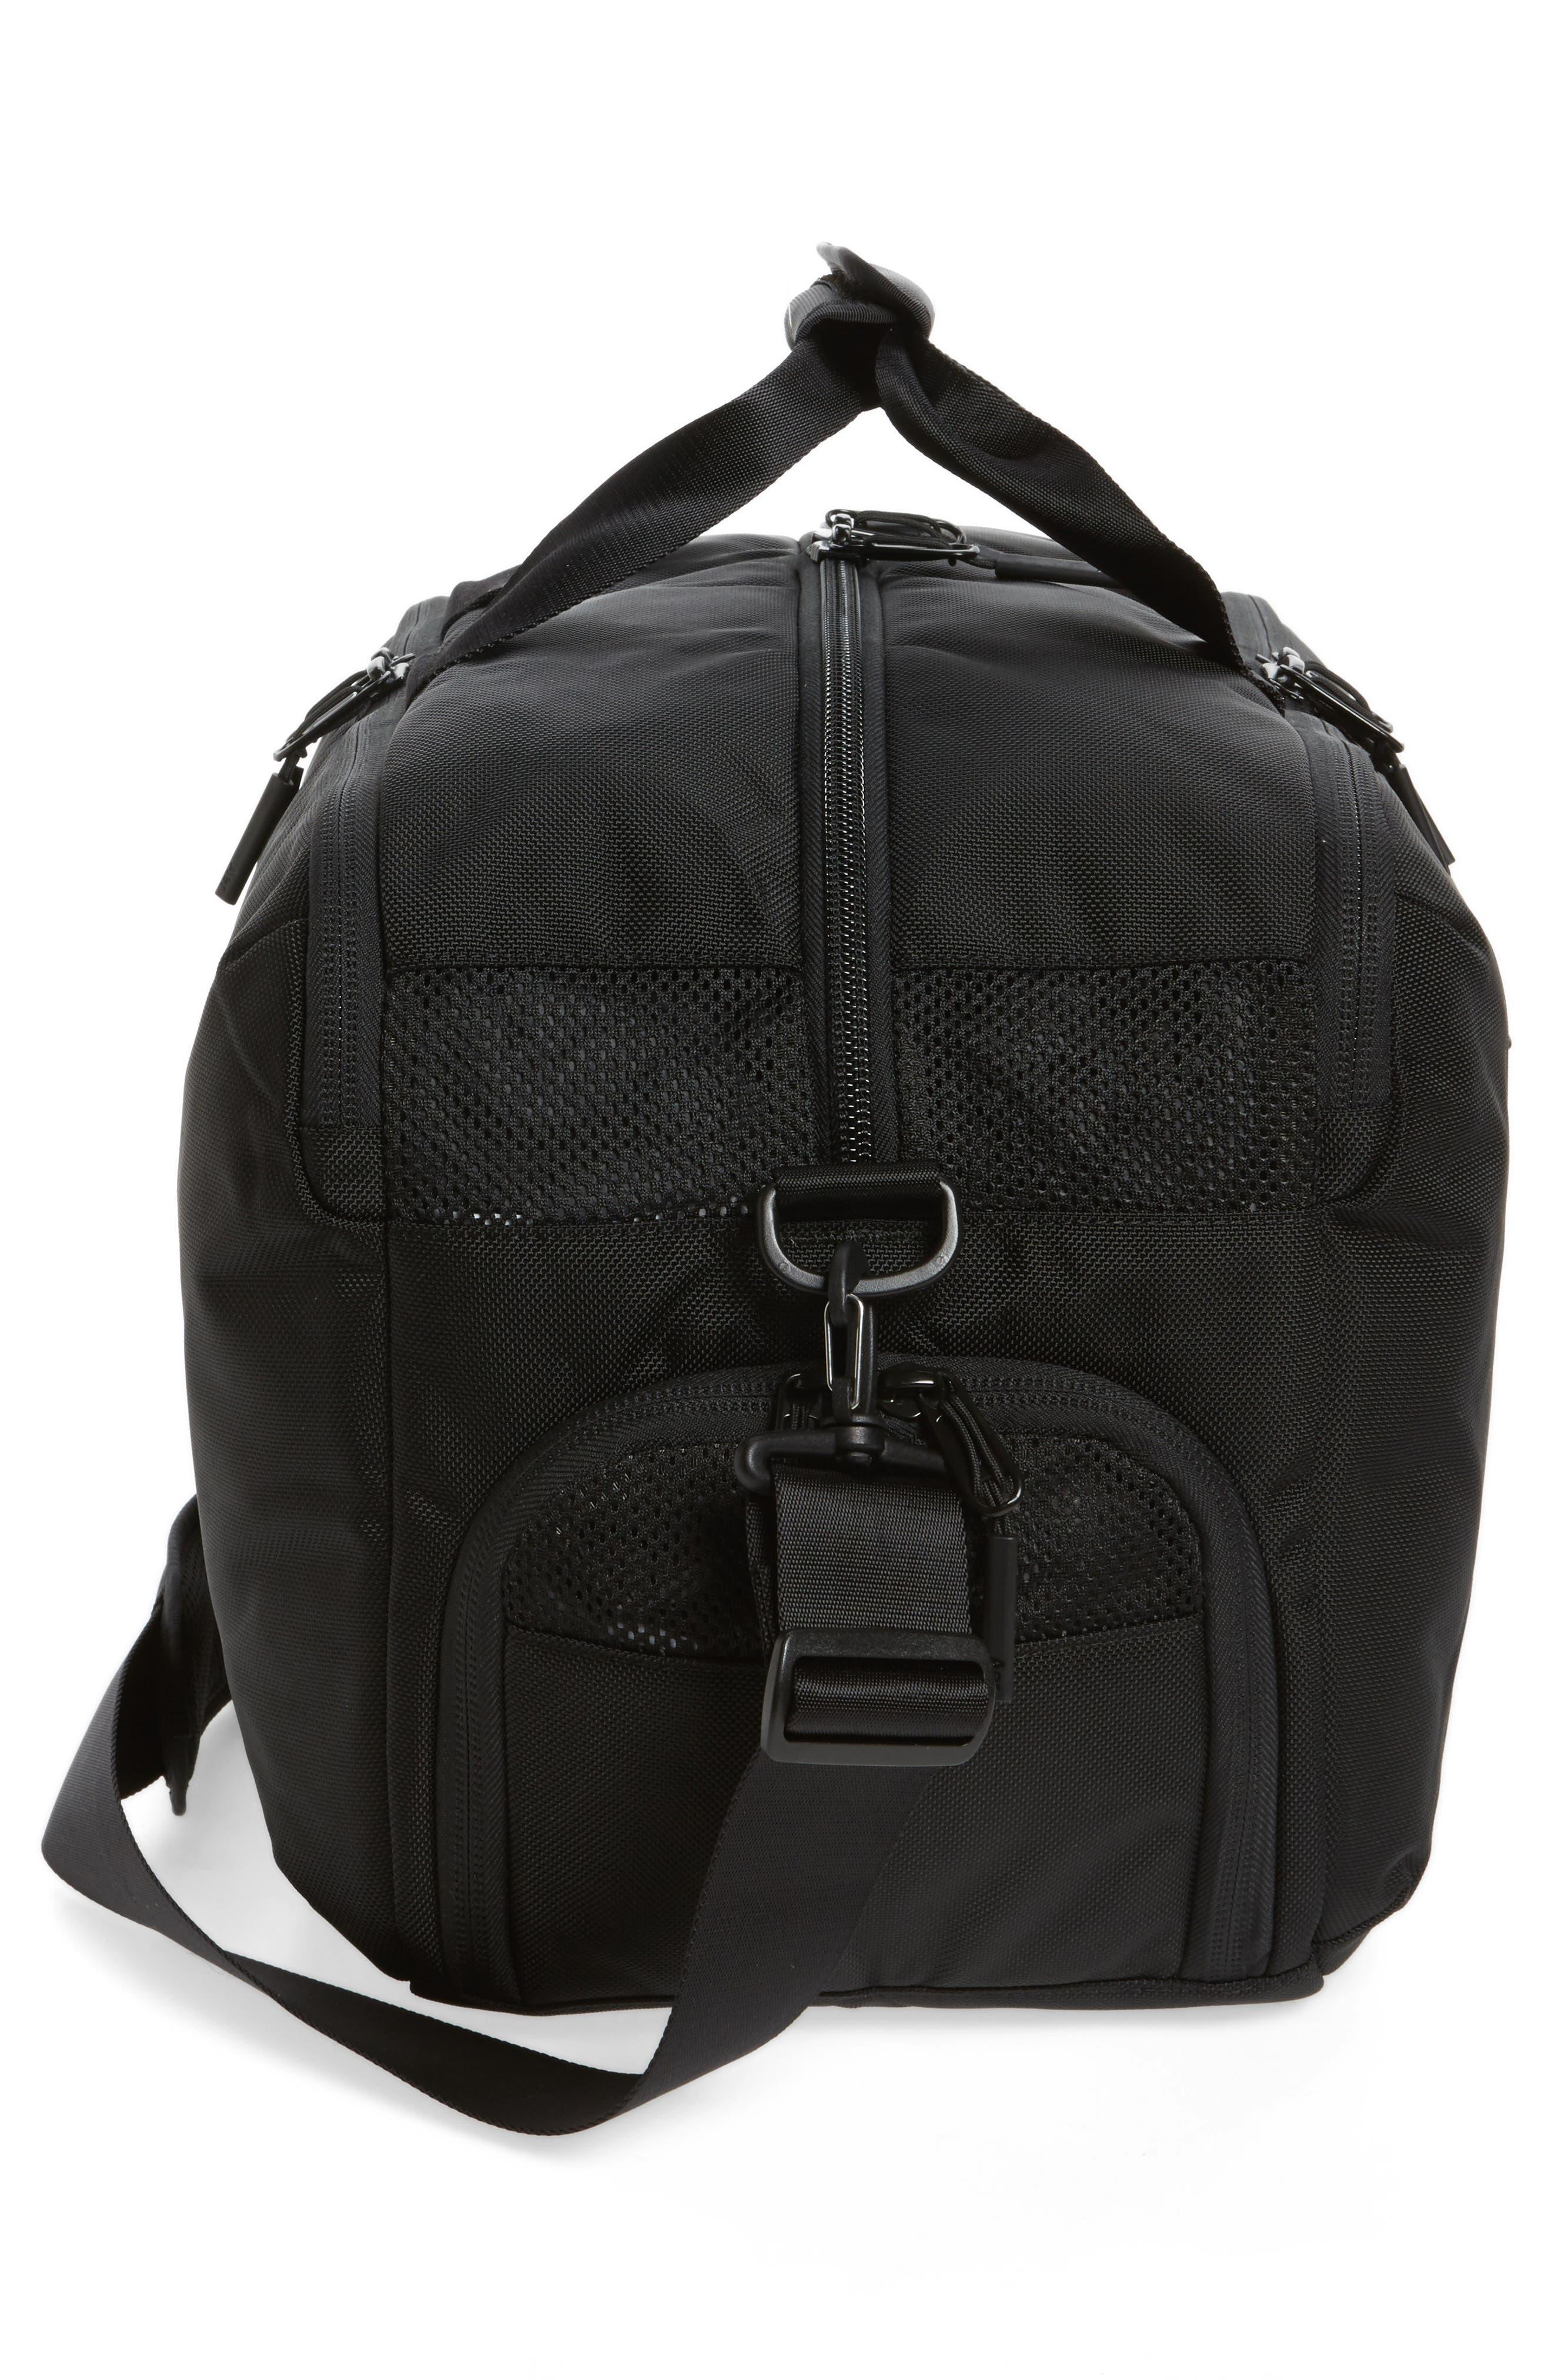 Gym Duffel 2 Bag,                             Alternate thumbnail 5, color,                             Black